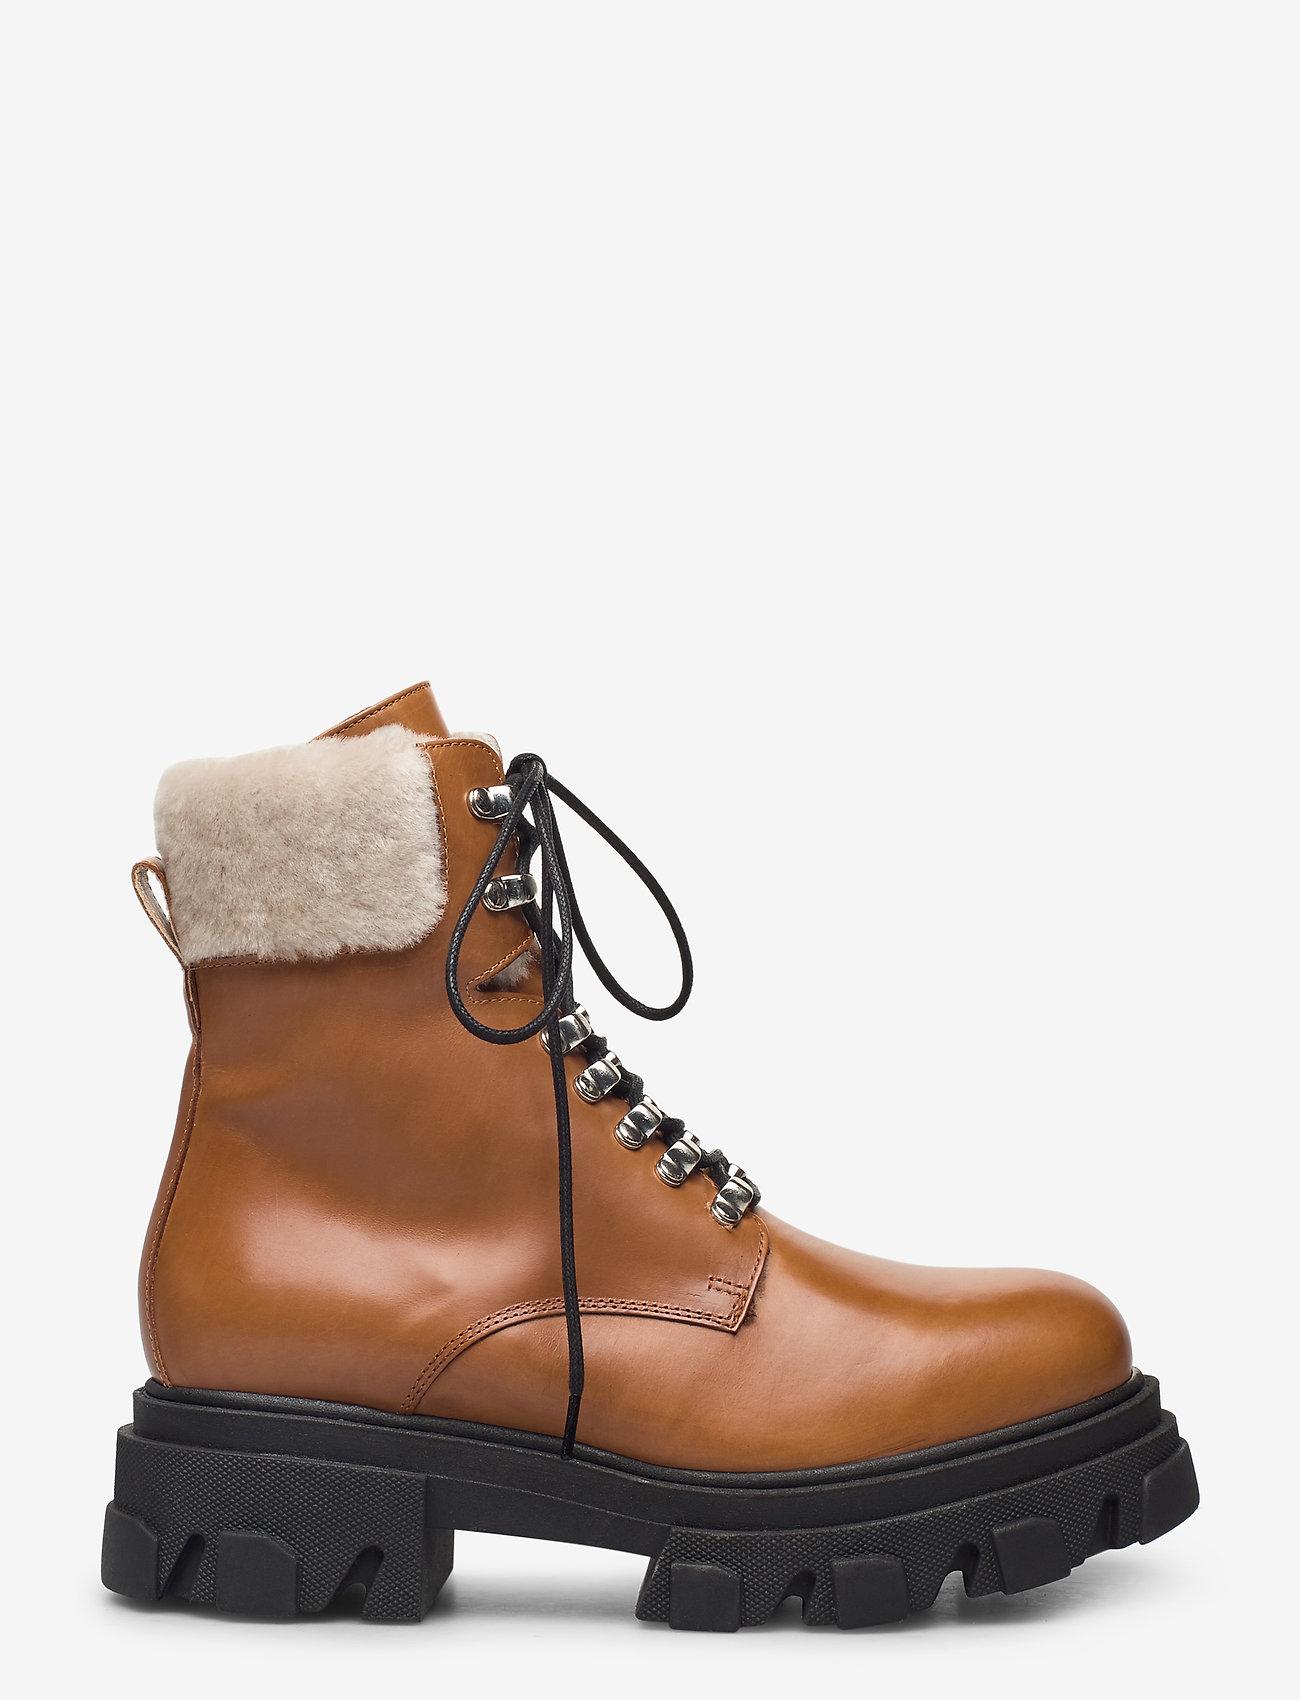 Apair - Chuncky ski - flat ankle boots - cognac - 1